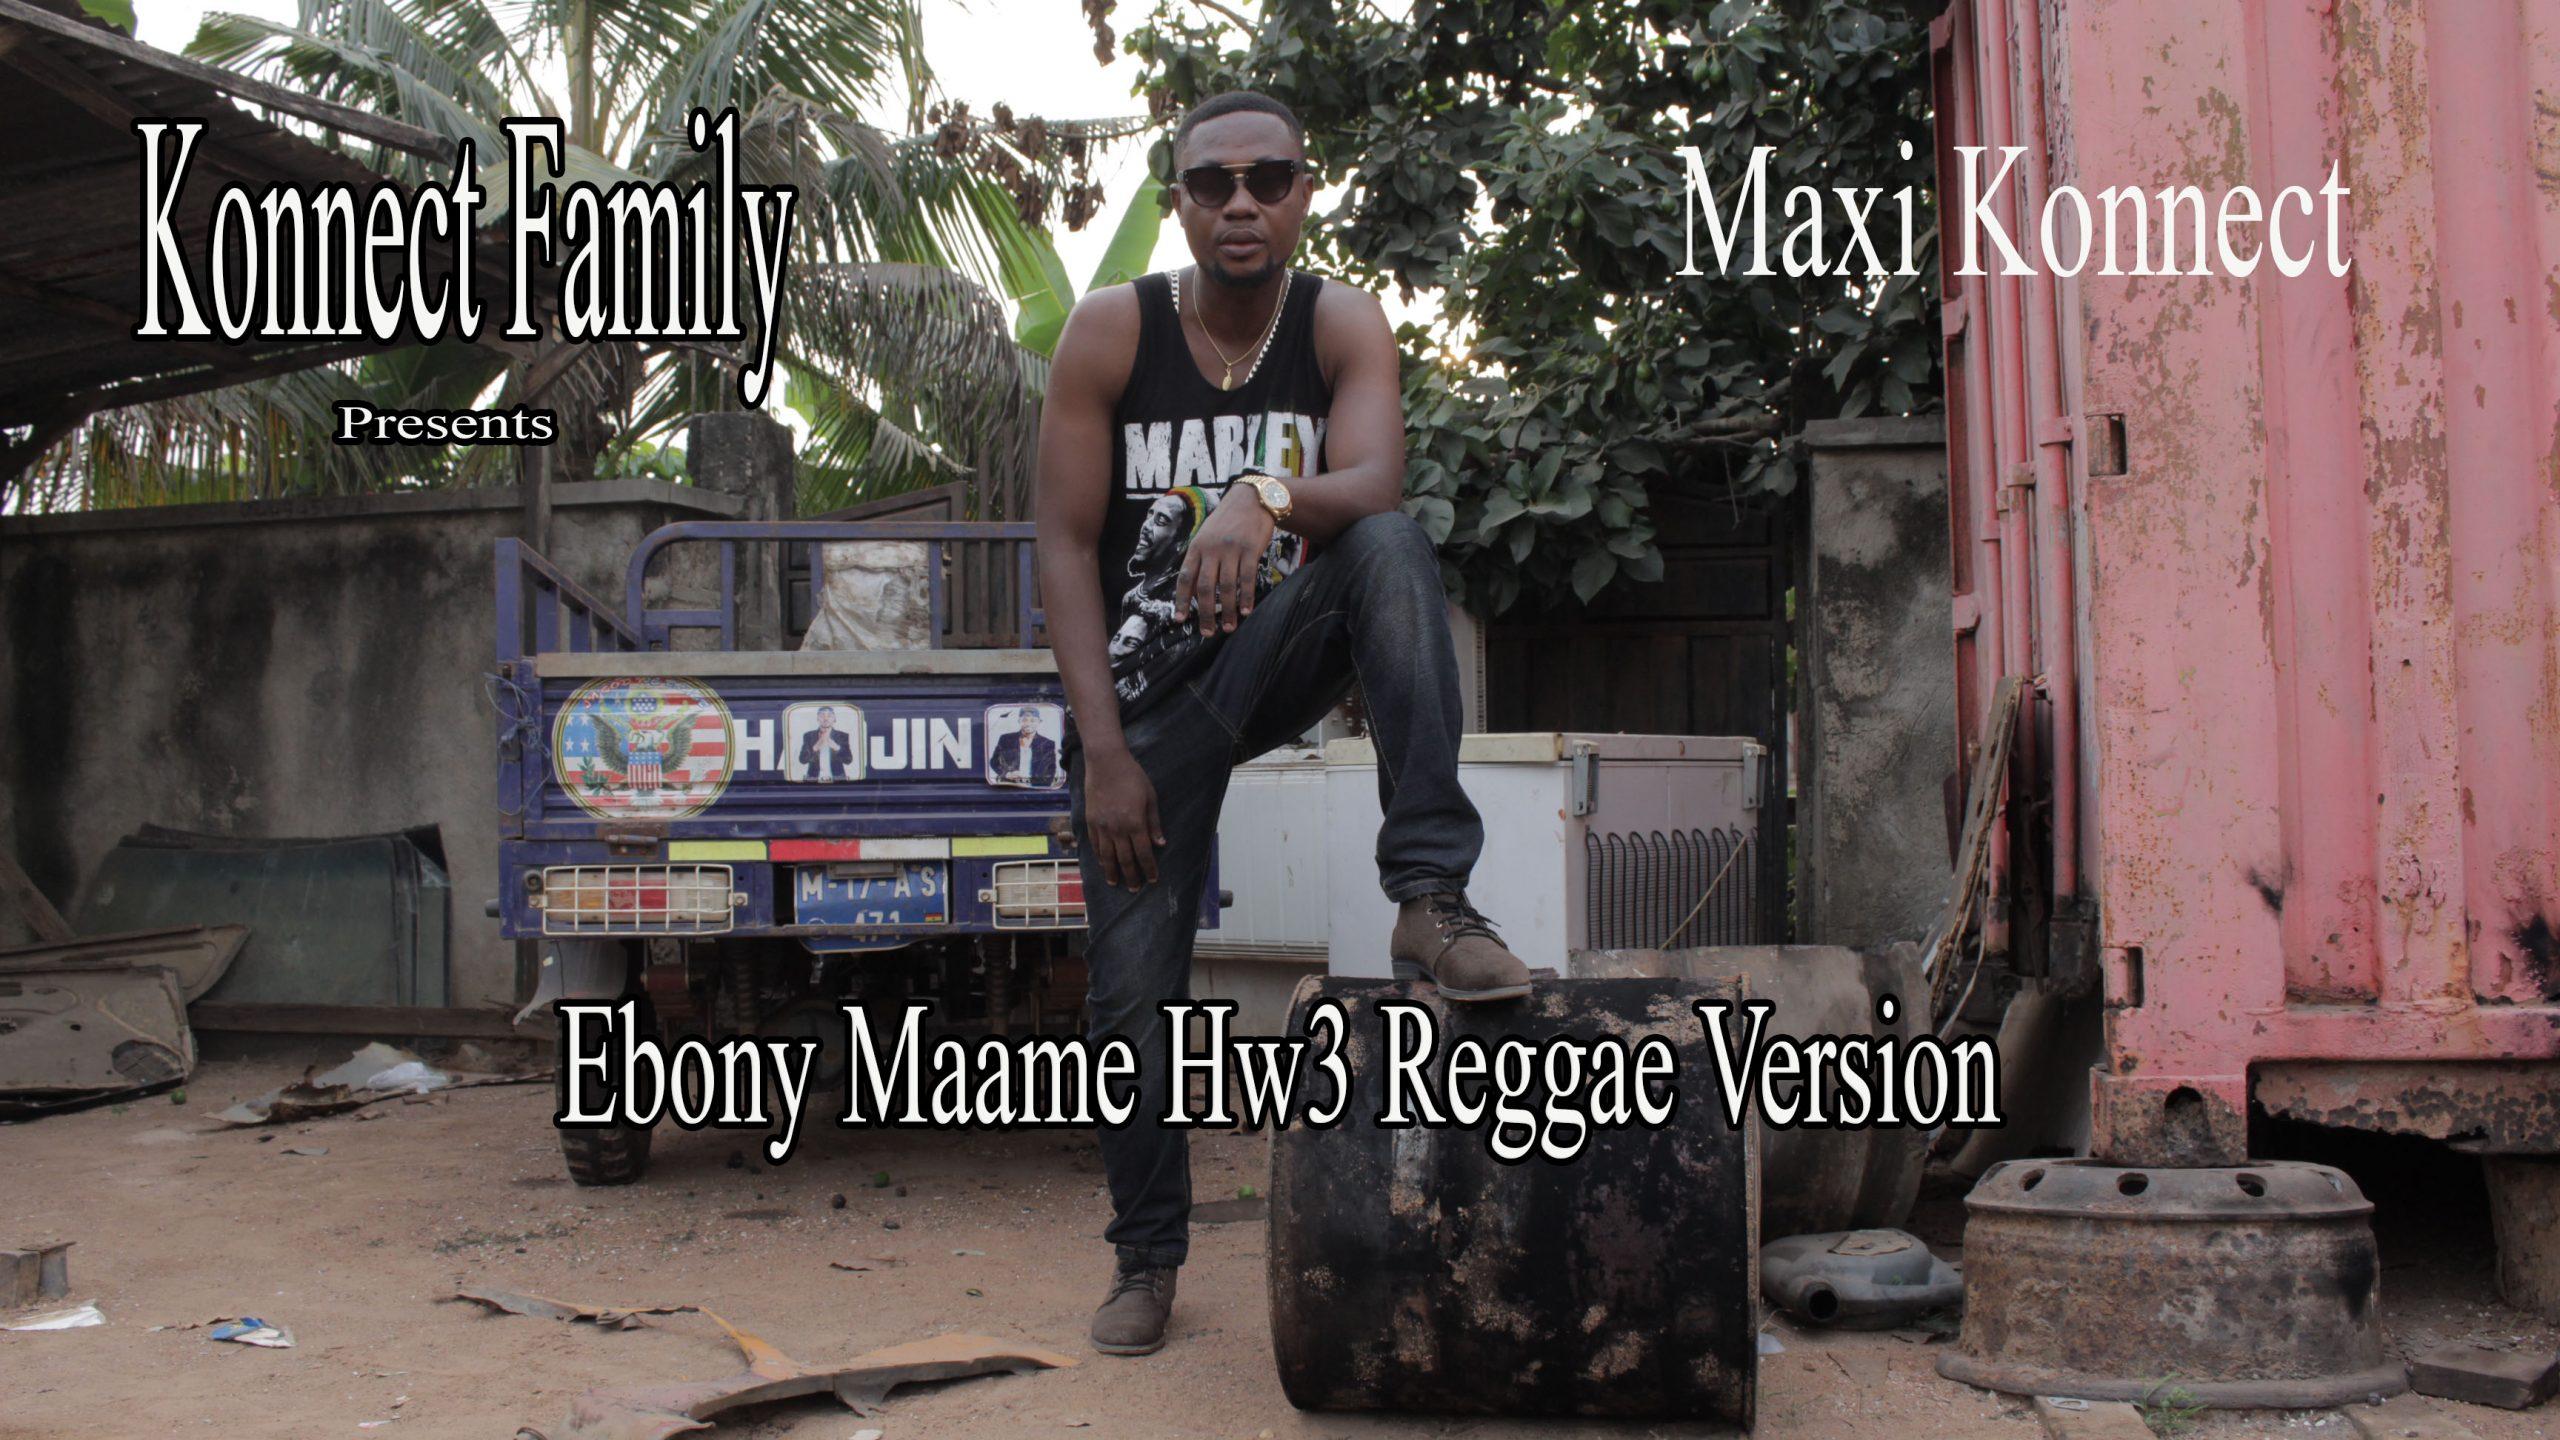 Maxi Konnect Ebony Maame Hw Reggae Version